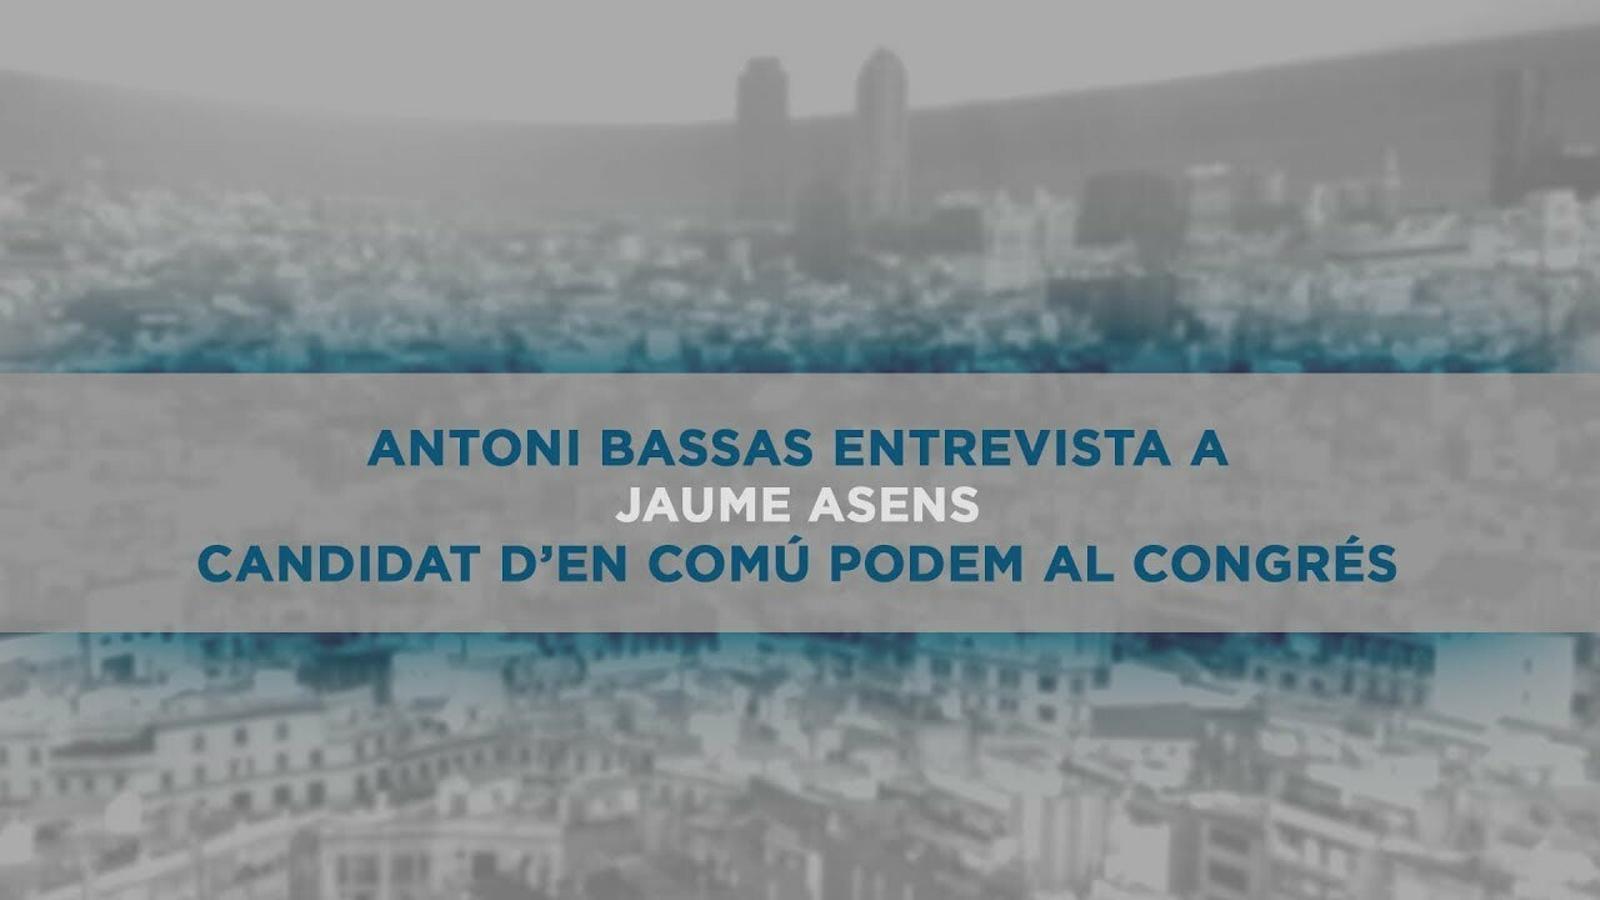 Entrevista d'Antoni Bassas a Jaume Asens